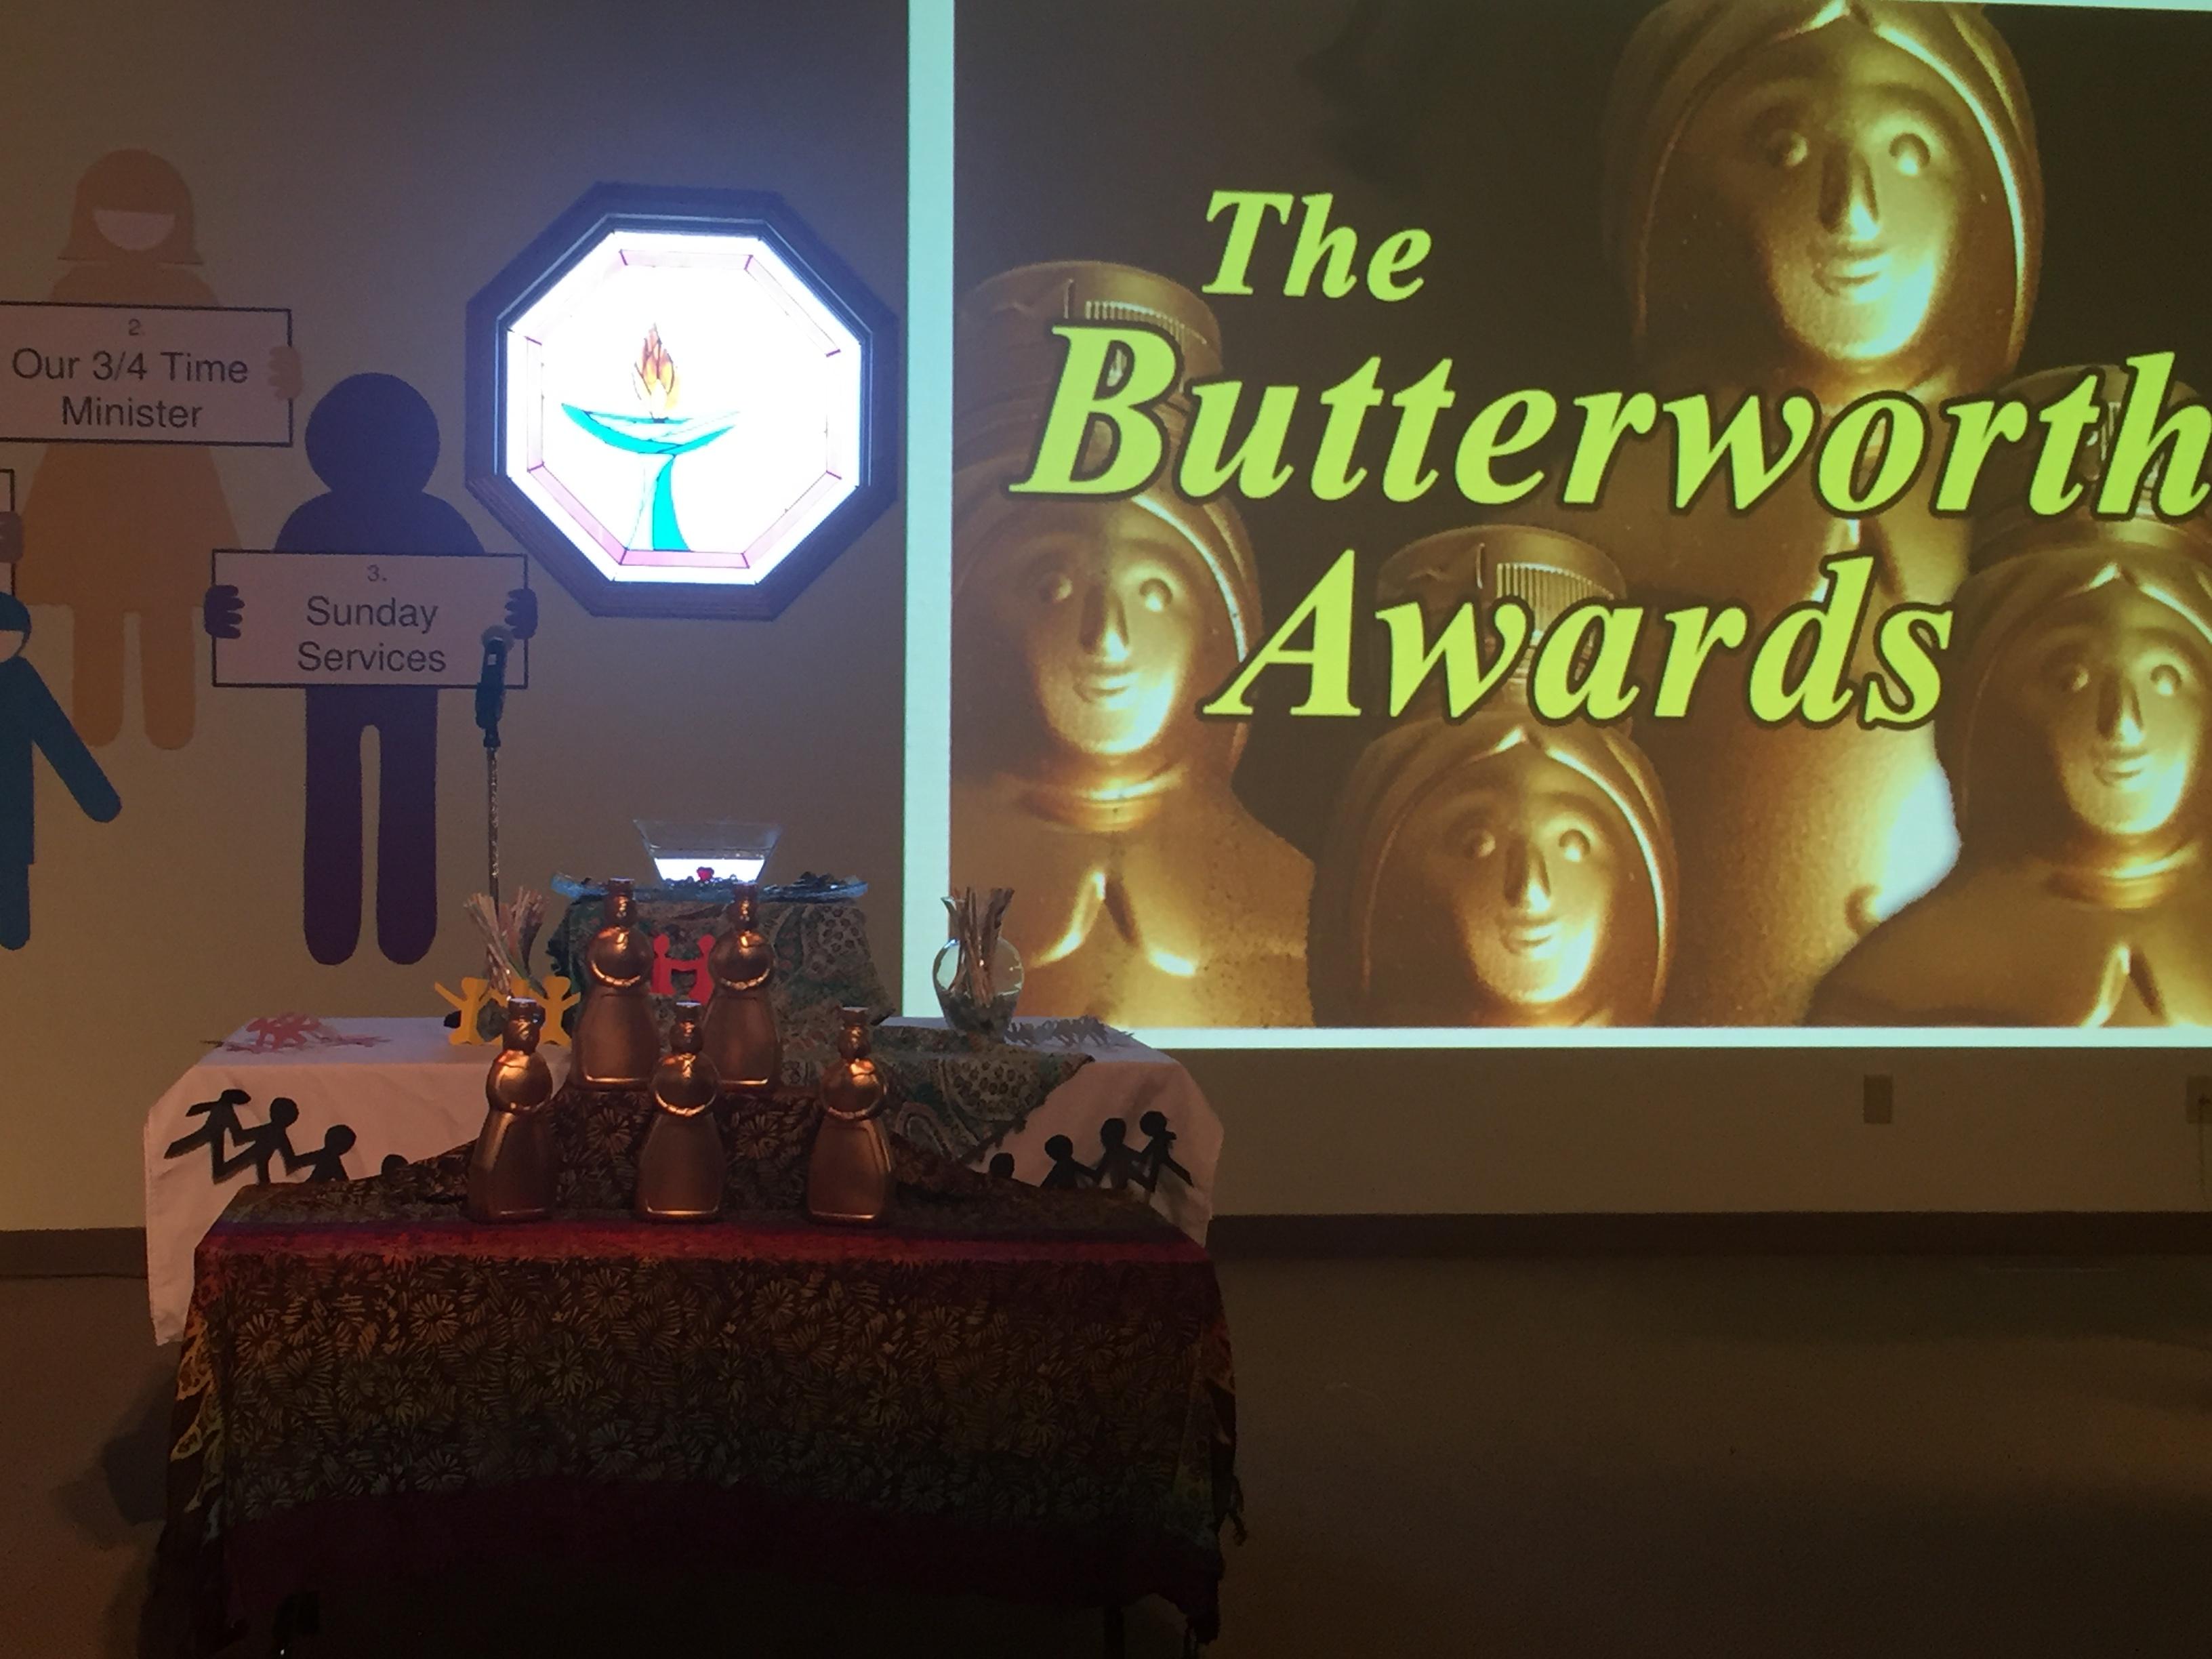 The Butterworth Awards